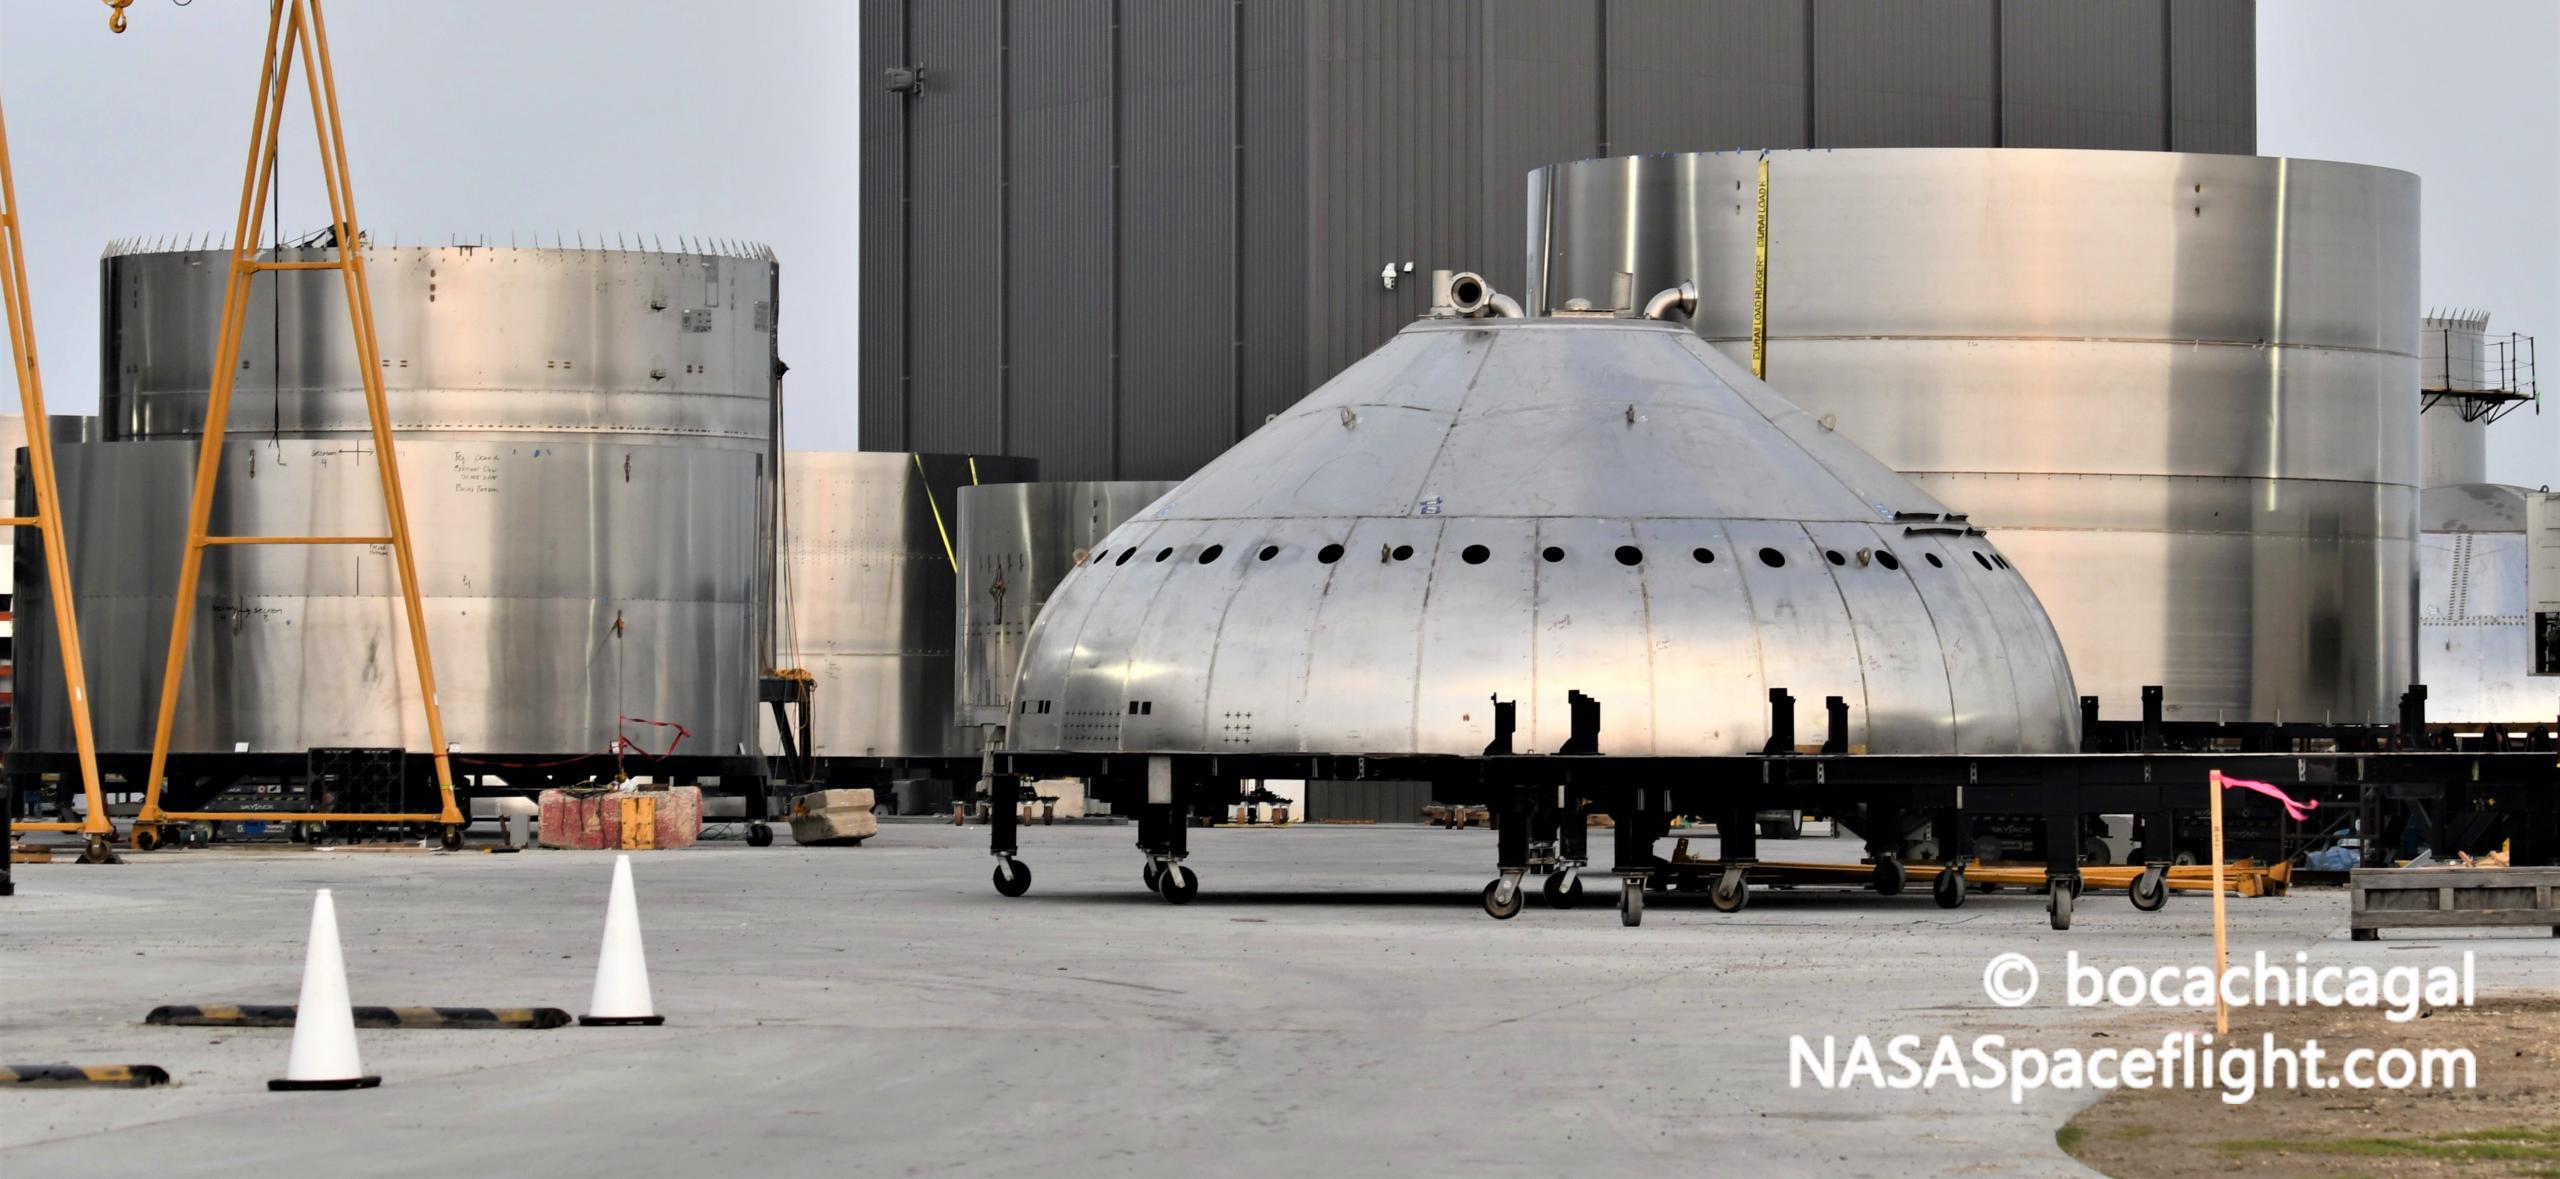 Starship Boca Chica 012521 (NASASpaceflight – bocachicagal) Super Heavy thrust dome practice 2 crop (c)